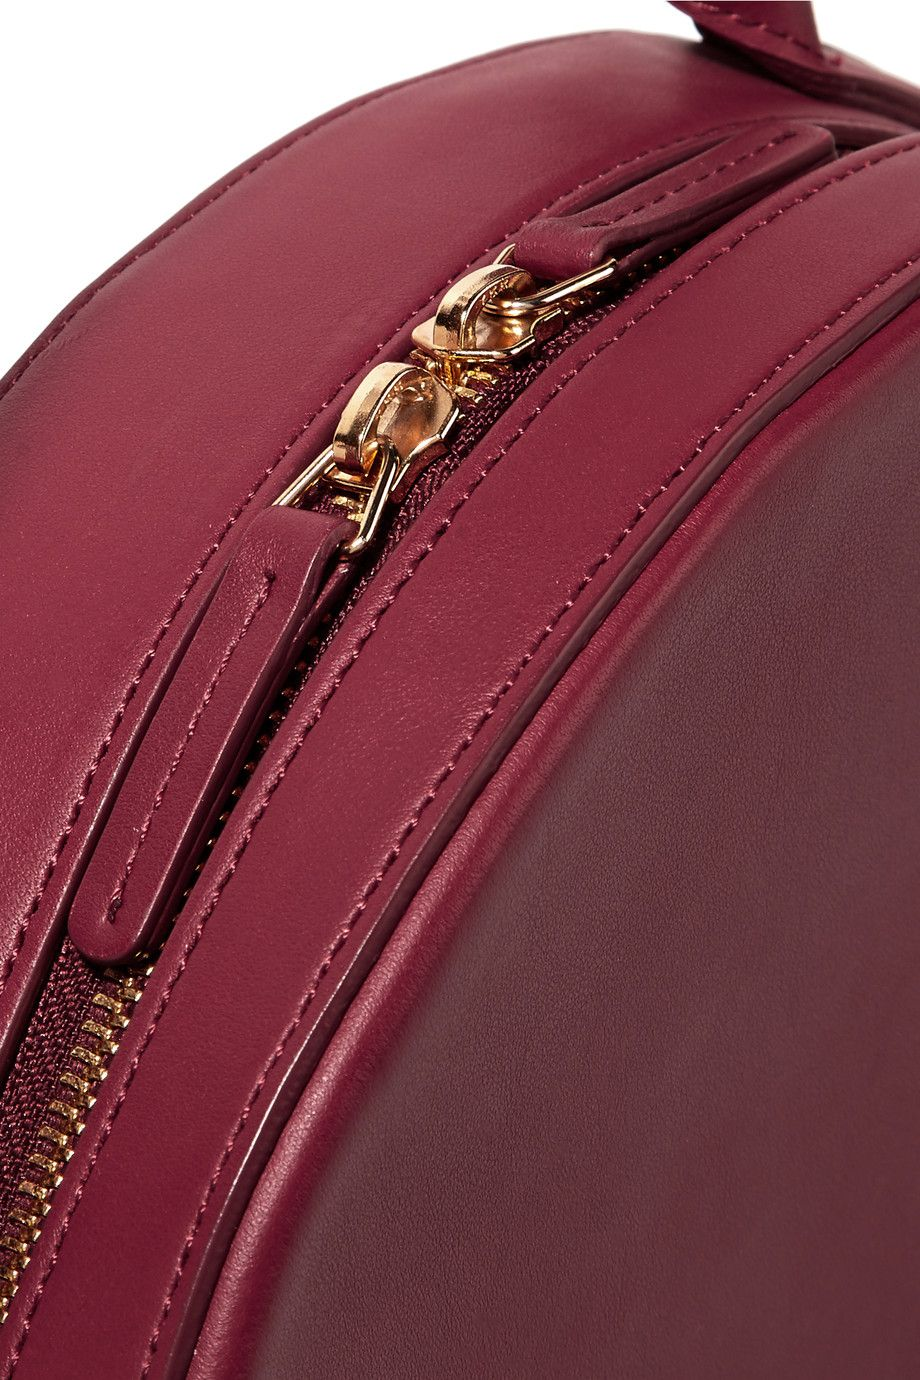 Mansur Gavriel | Circle leather tote | NET-A-PORTER.COM